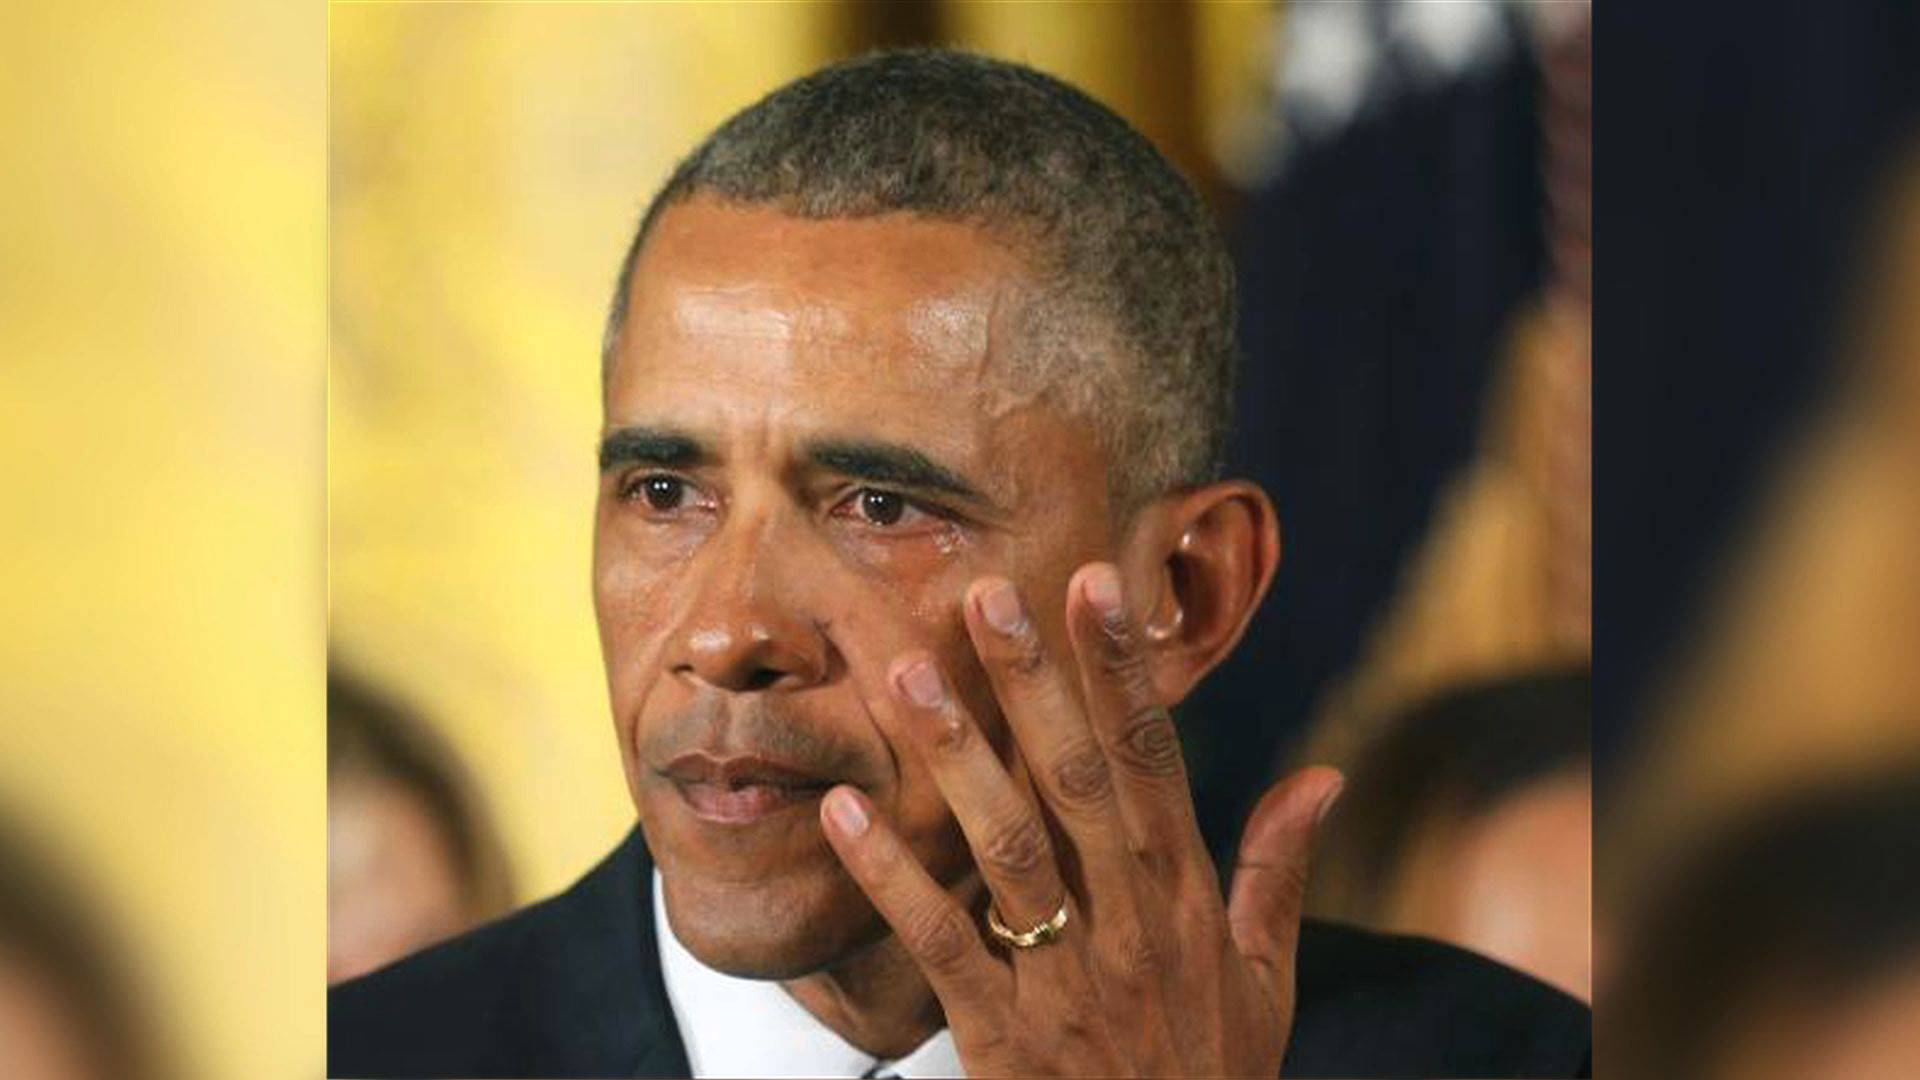 obama care should be taken away